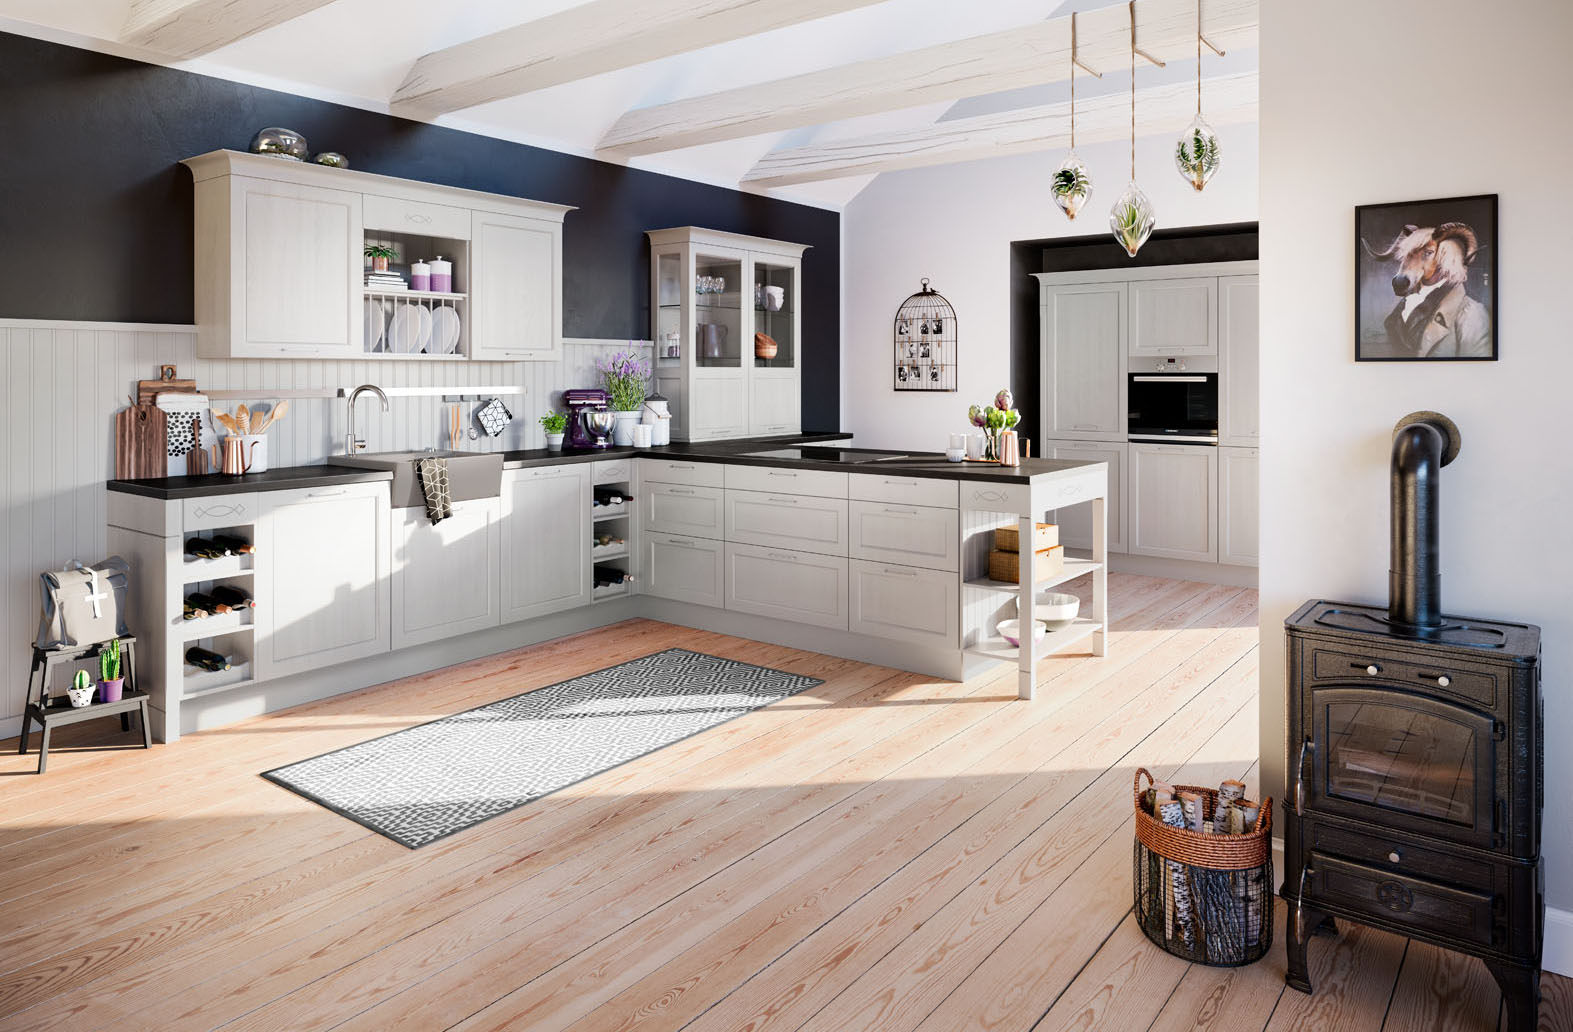 Full Size of Real Küchen Systemat Art Hcker Kchen Regal Wohnzimmer Real Küchen